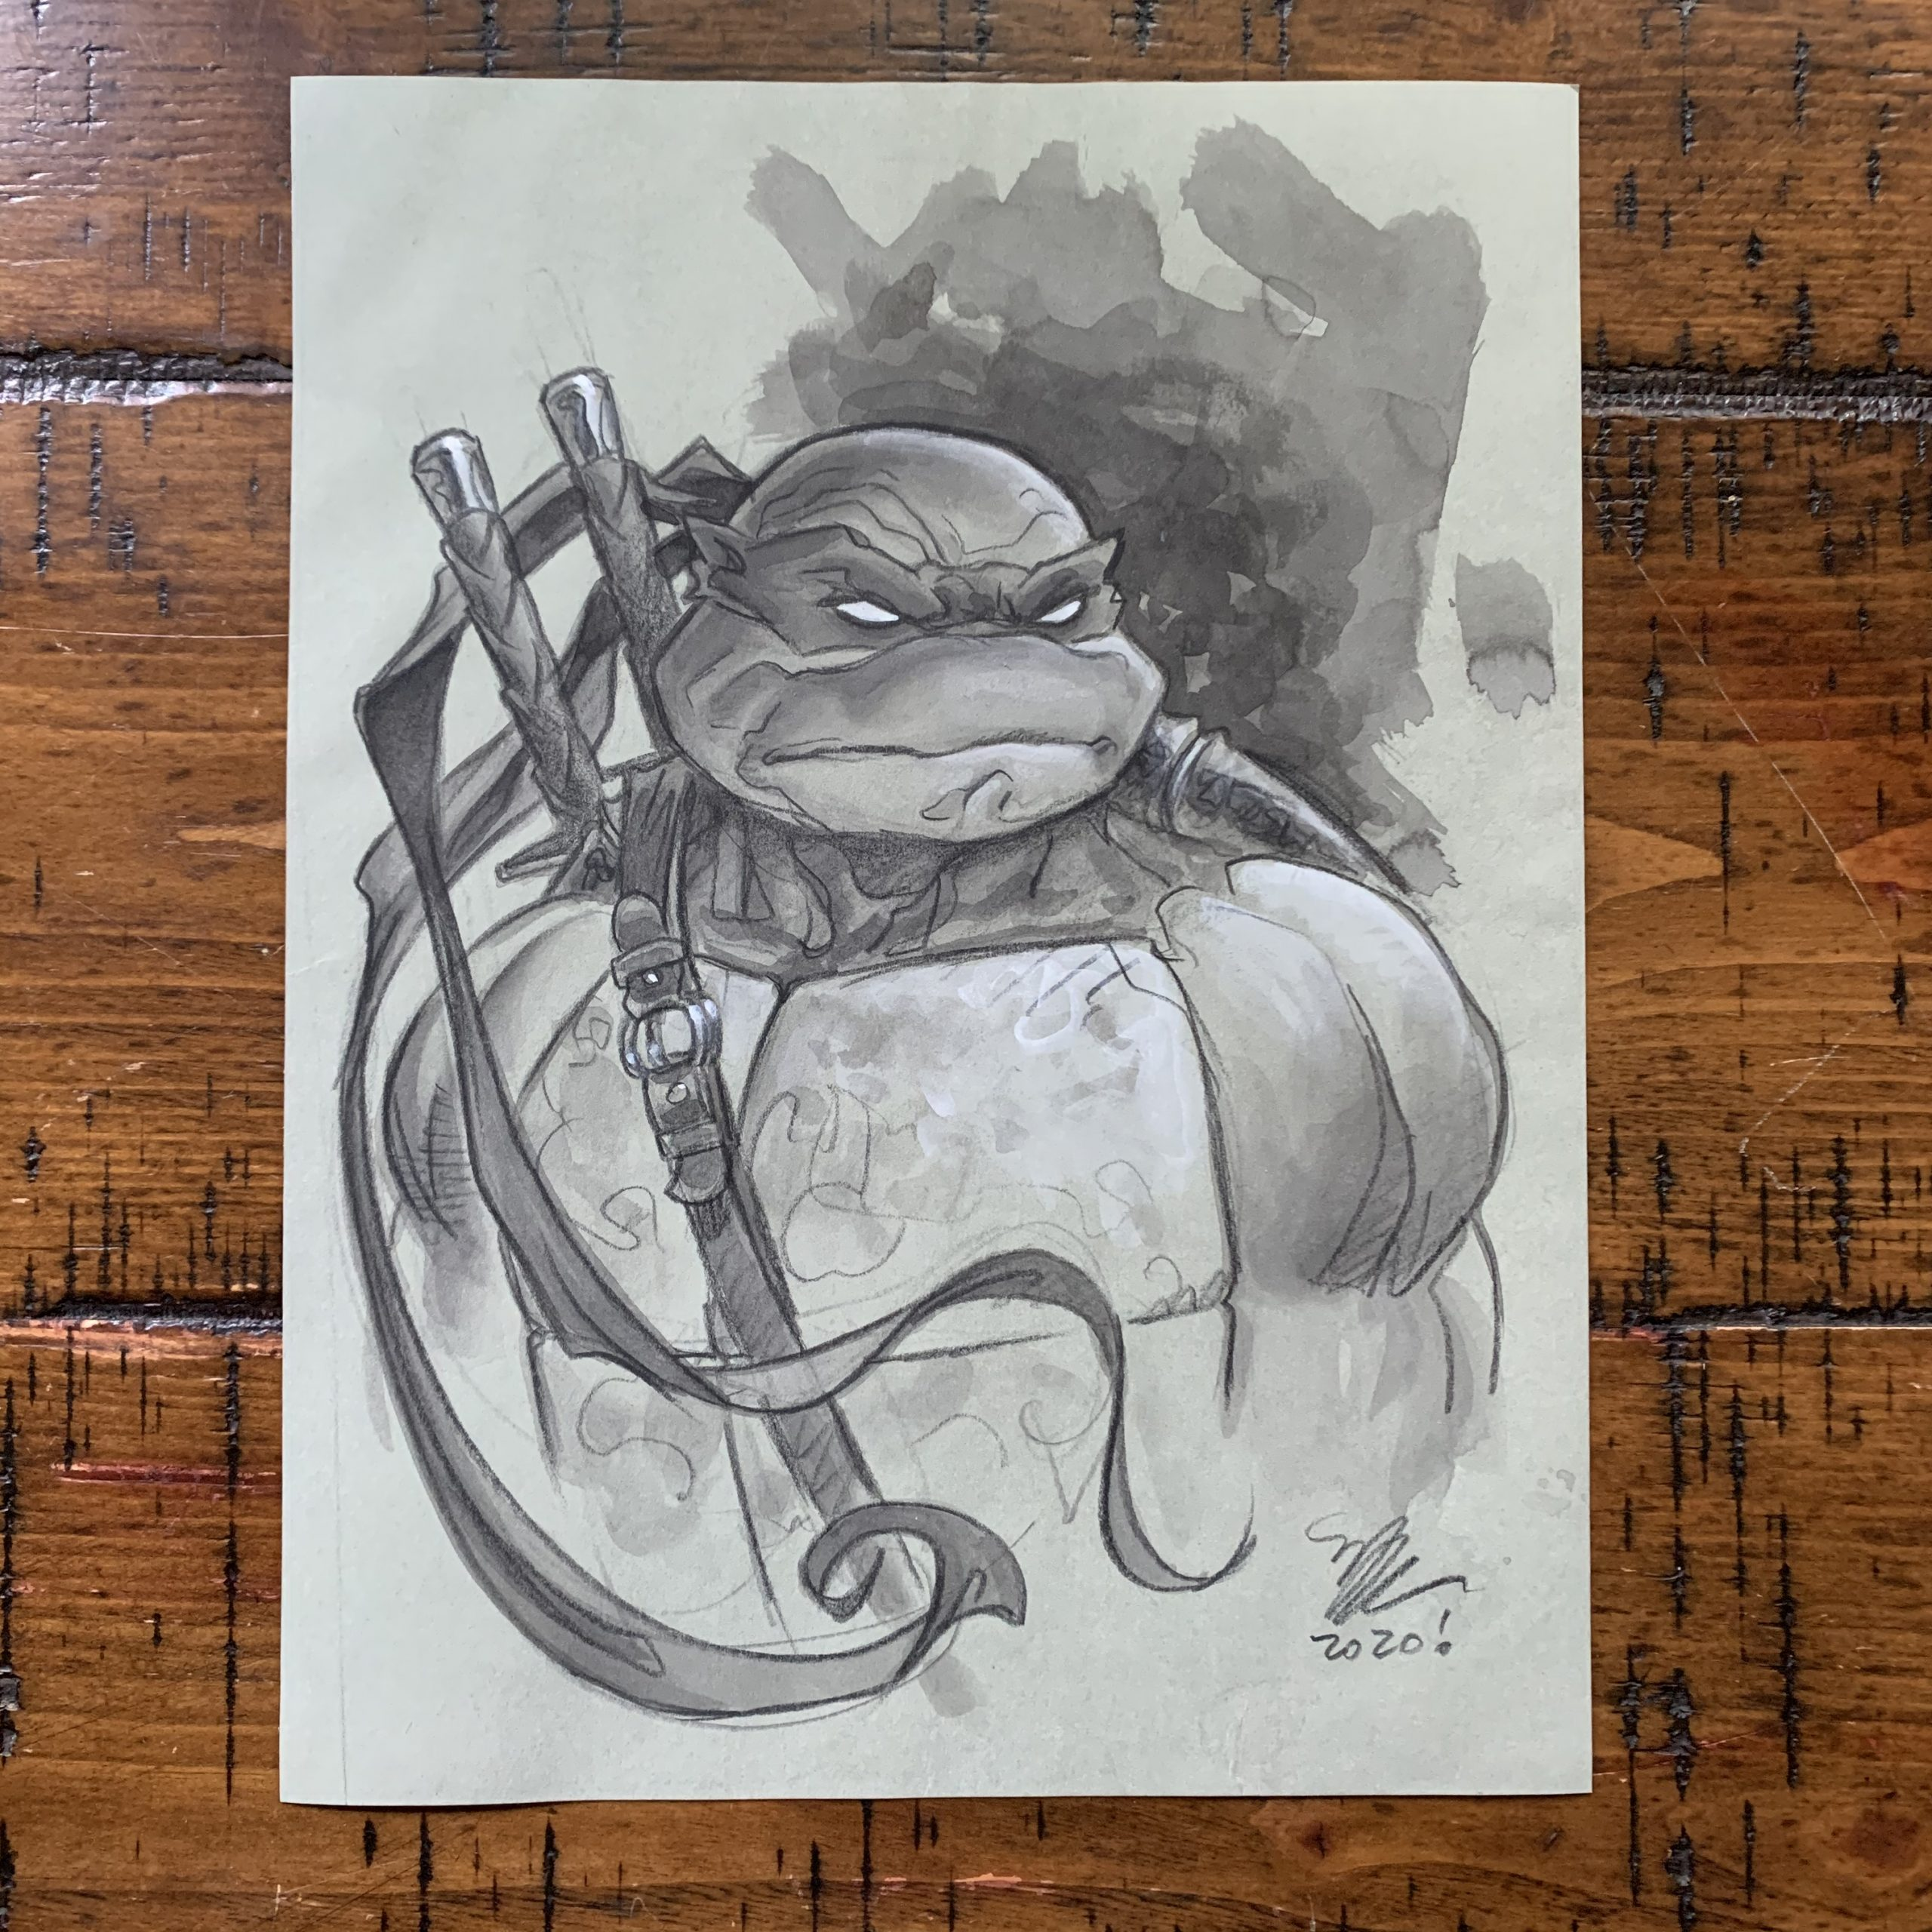 An Auction to Benefit Turtle Rehabilitation